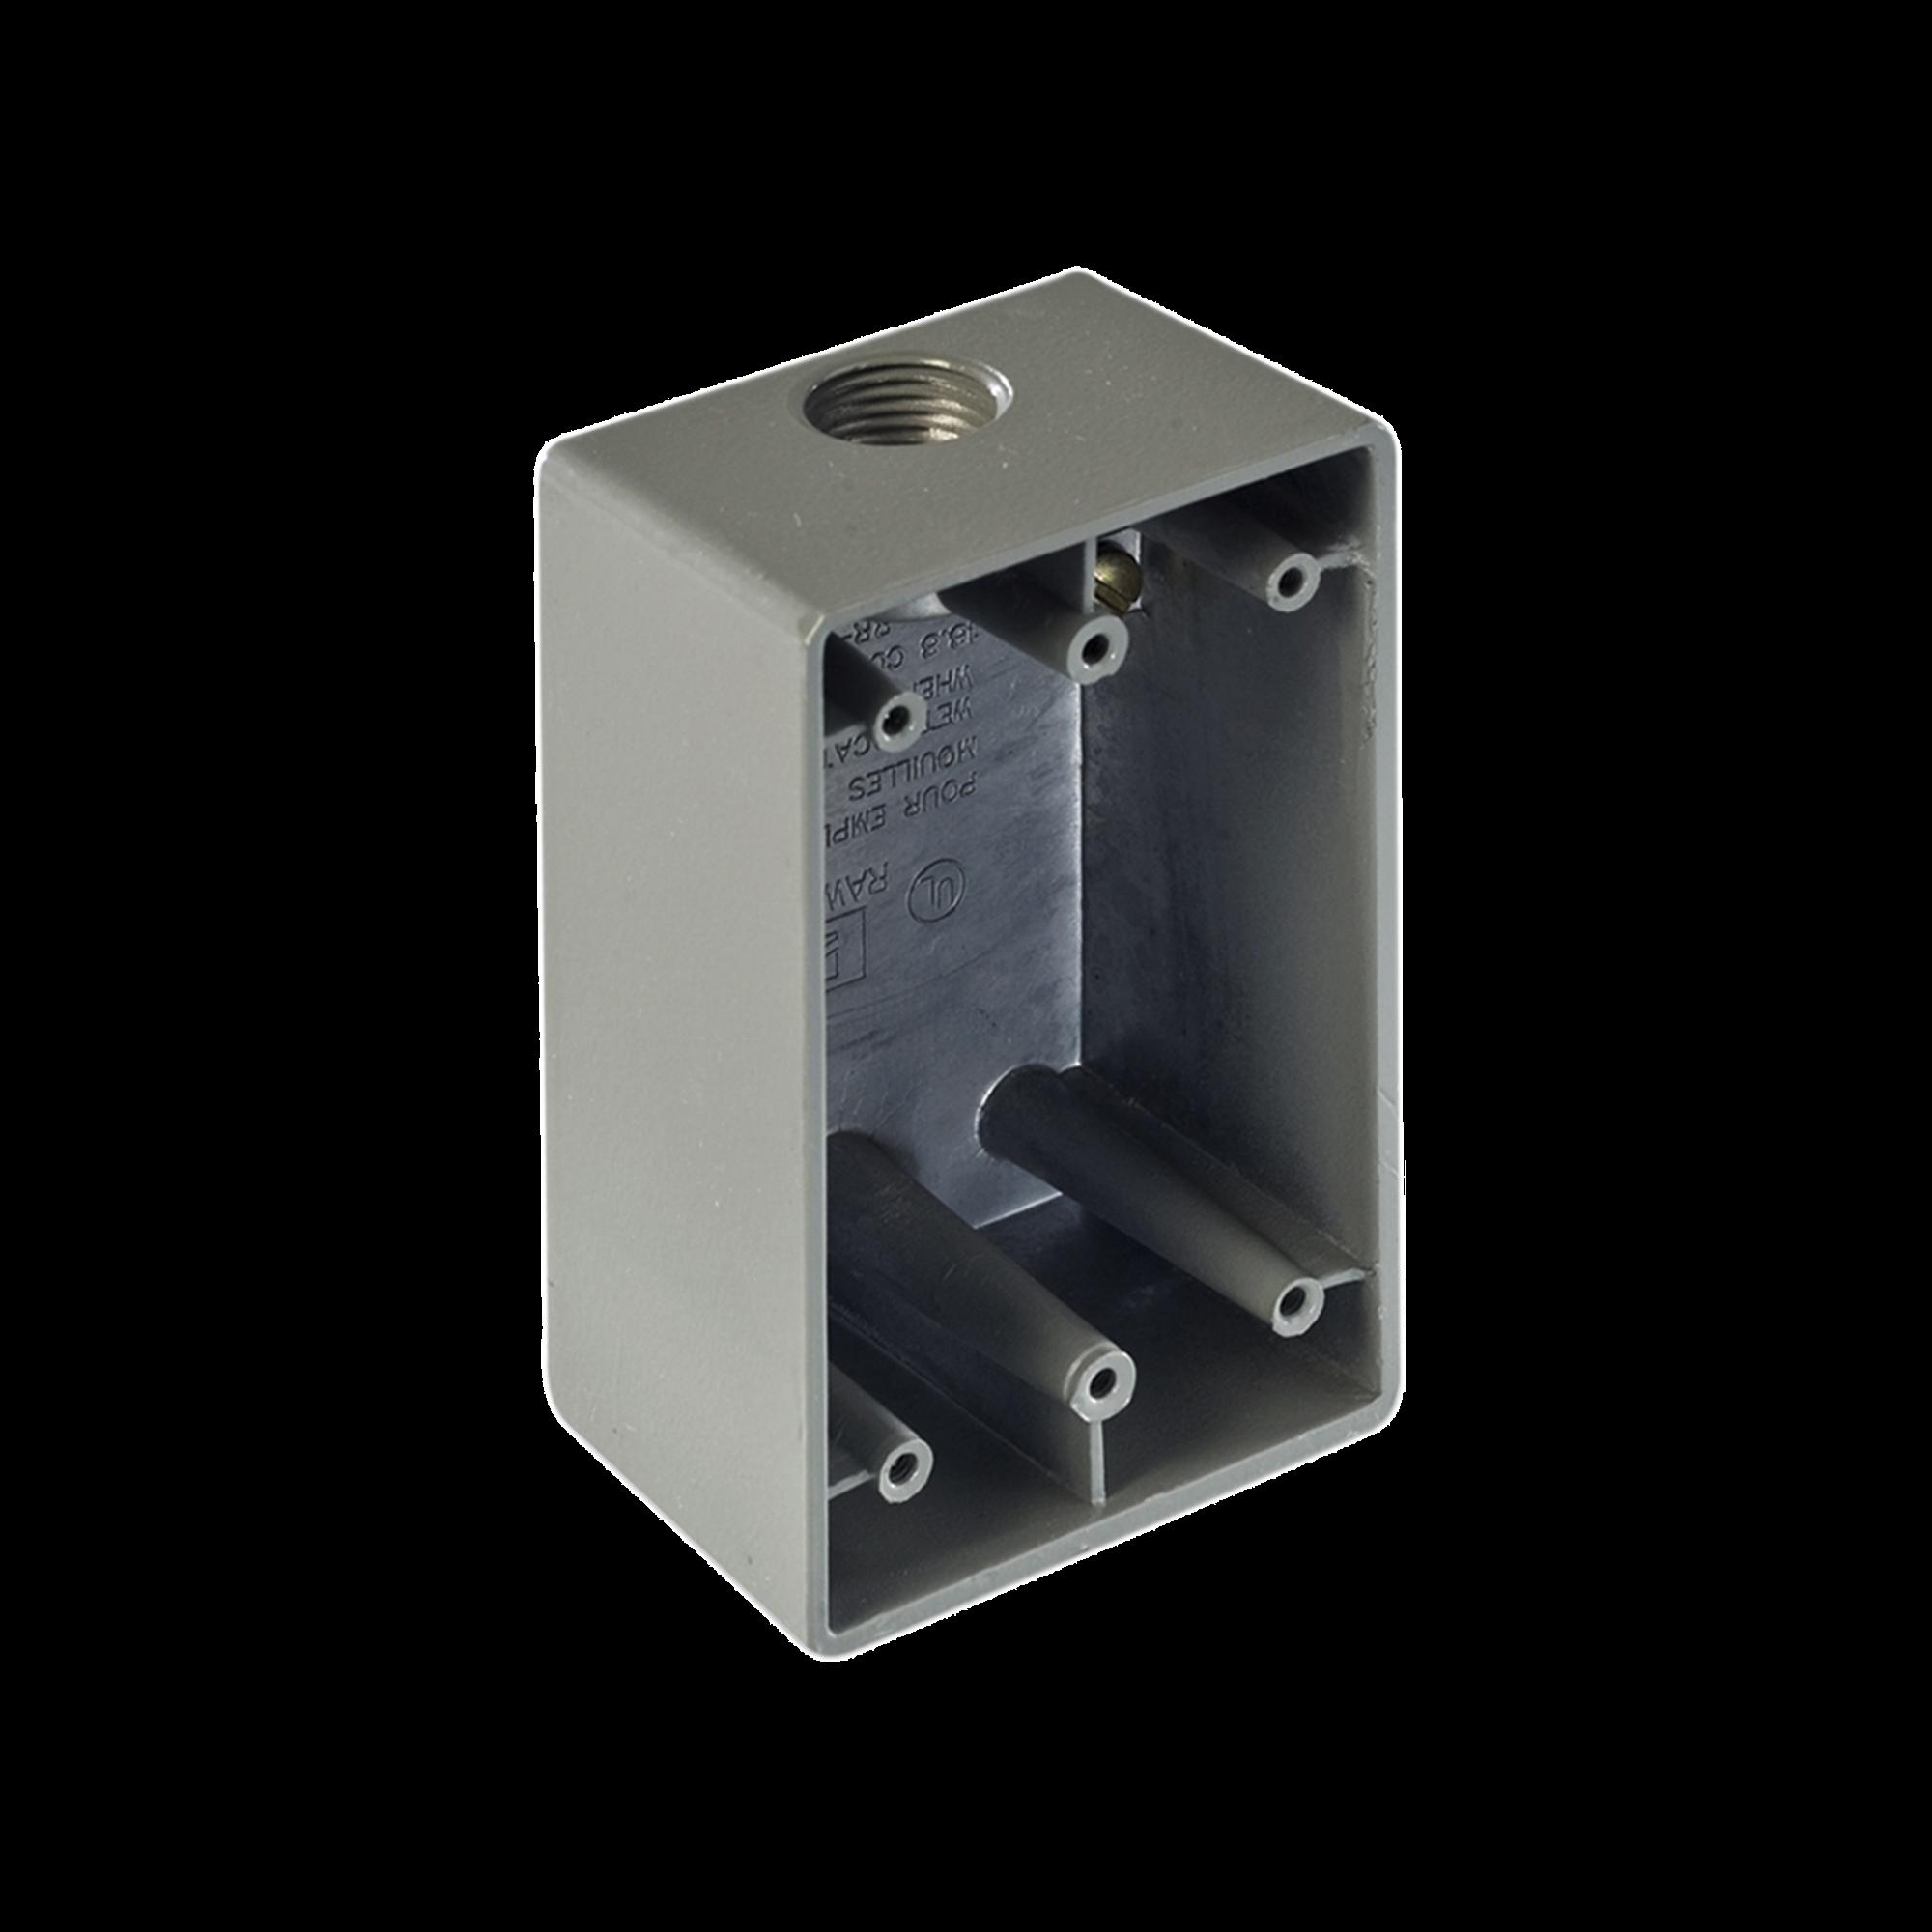 Caja Condulet FS de 3/4 ( 19.05 mm) con una boca a prueba de intemperie.